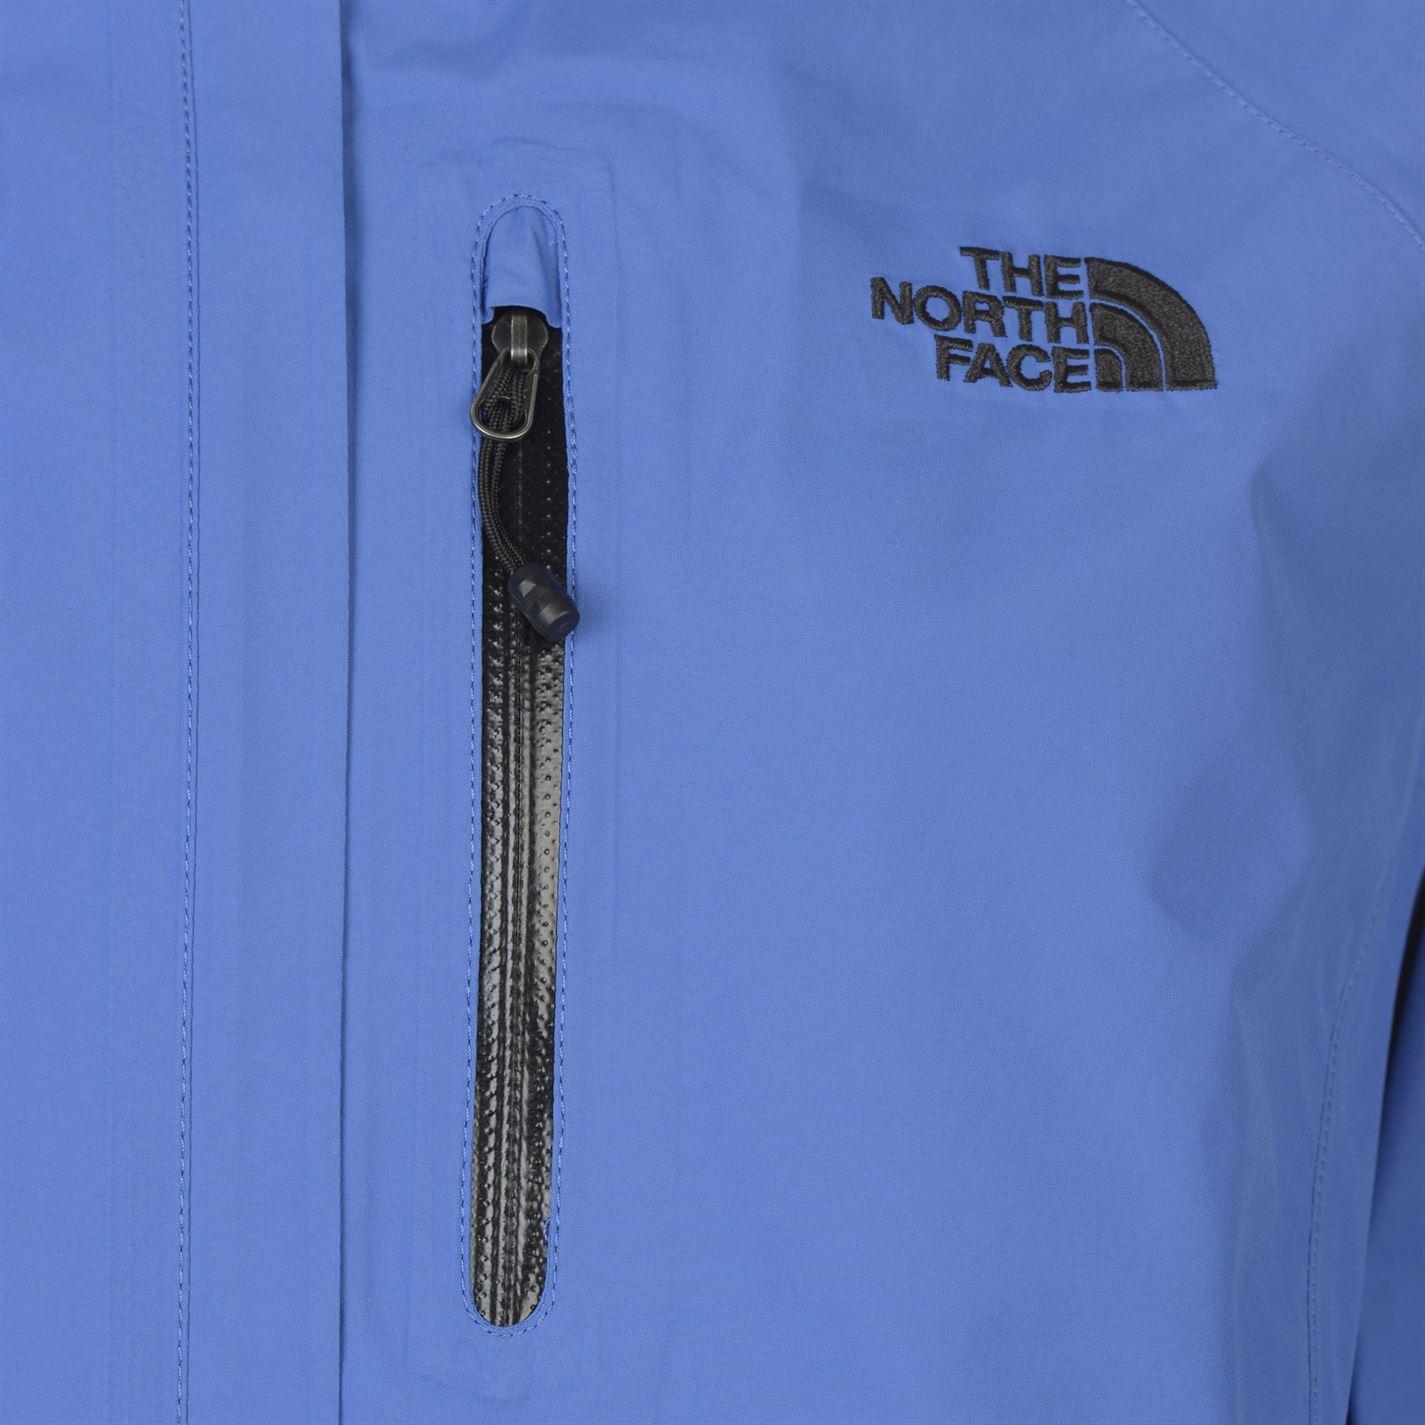 d372c4be8 The North Face Dryzzle 2.5L Jacket Ladies Water Repellent Coat Top Full  Length | eBay